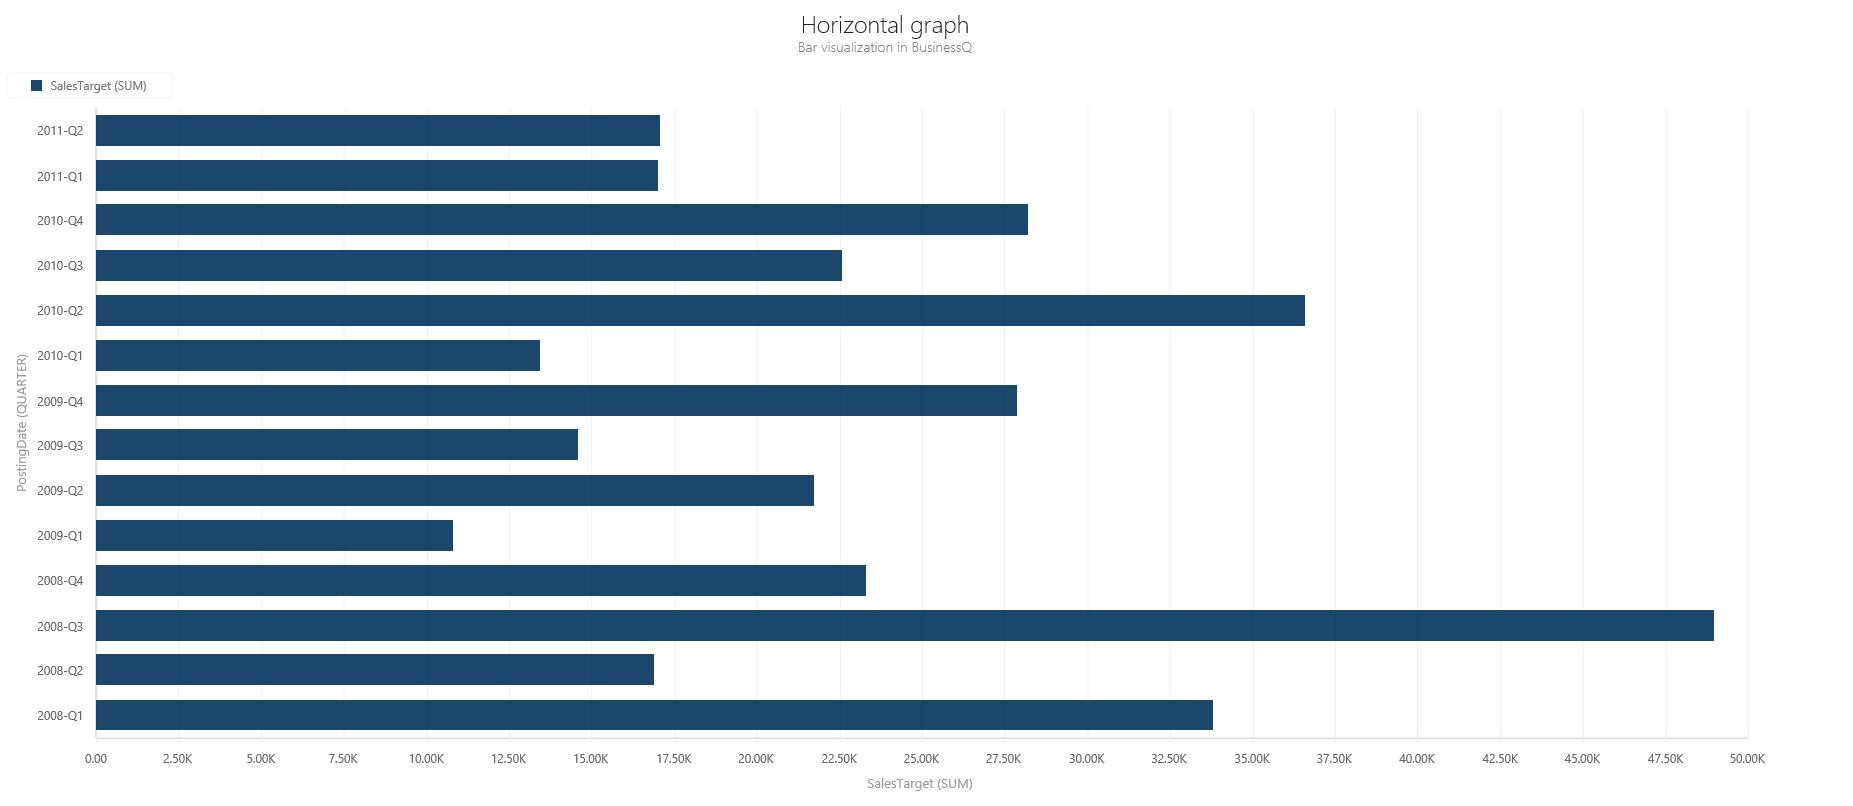 BQ_Horizontal_graph_1_Horizontal_Bar